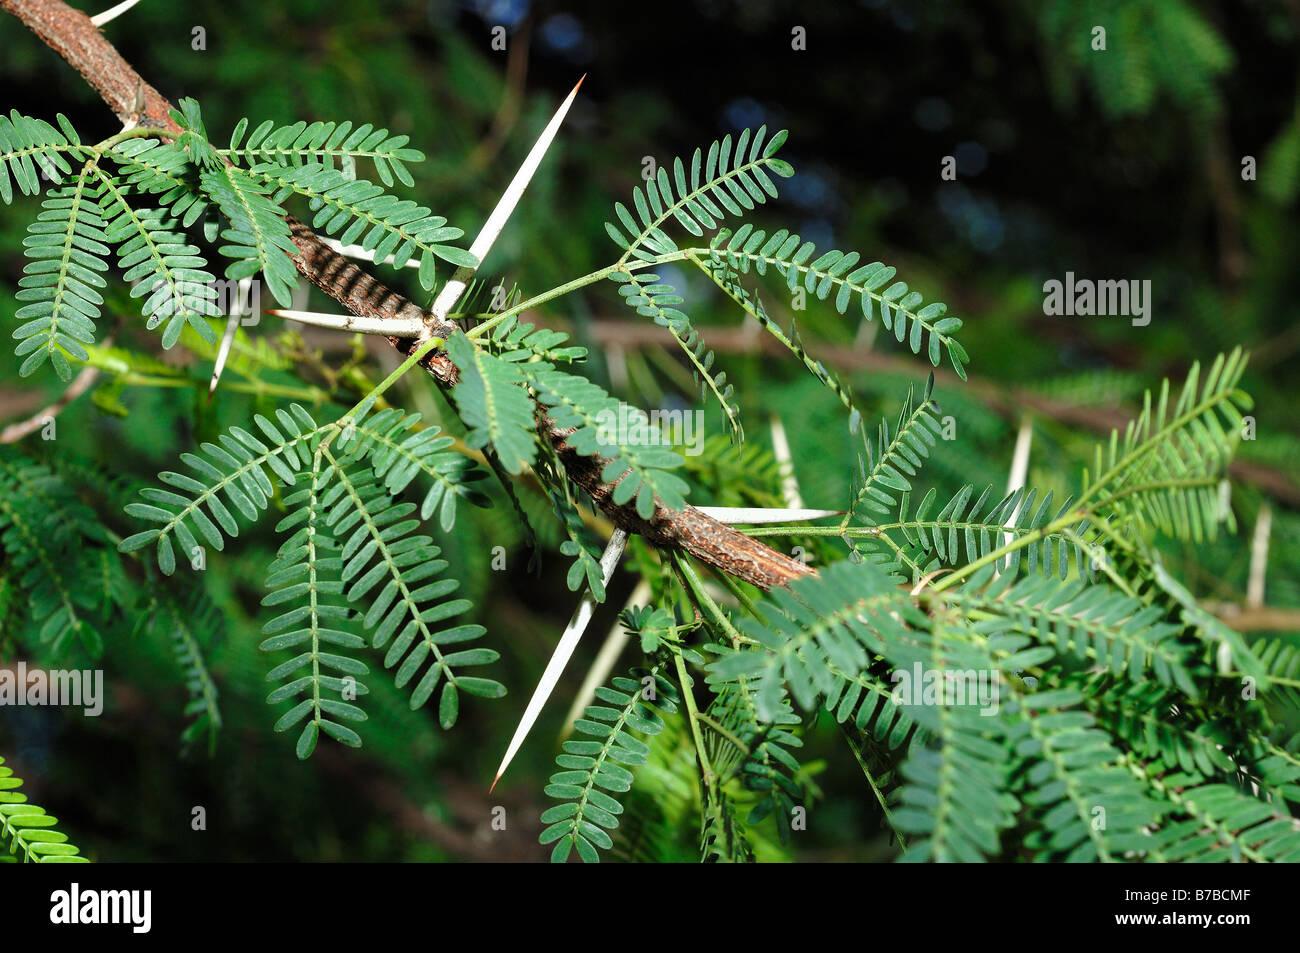 Acacia Karroo Detail Of Leaves Stock Photo 21764415 Alamy